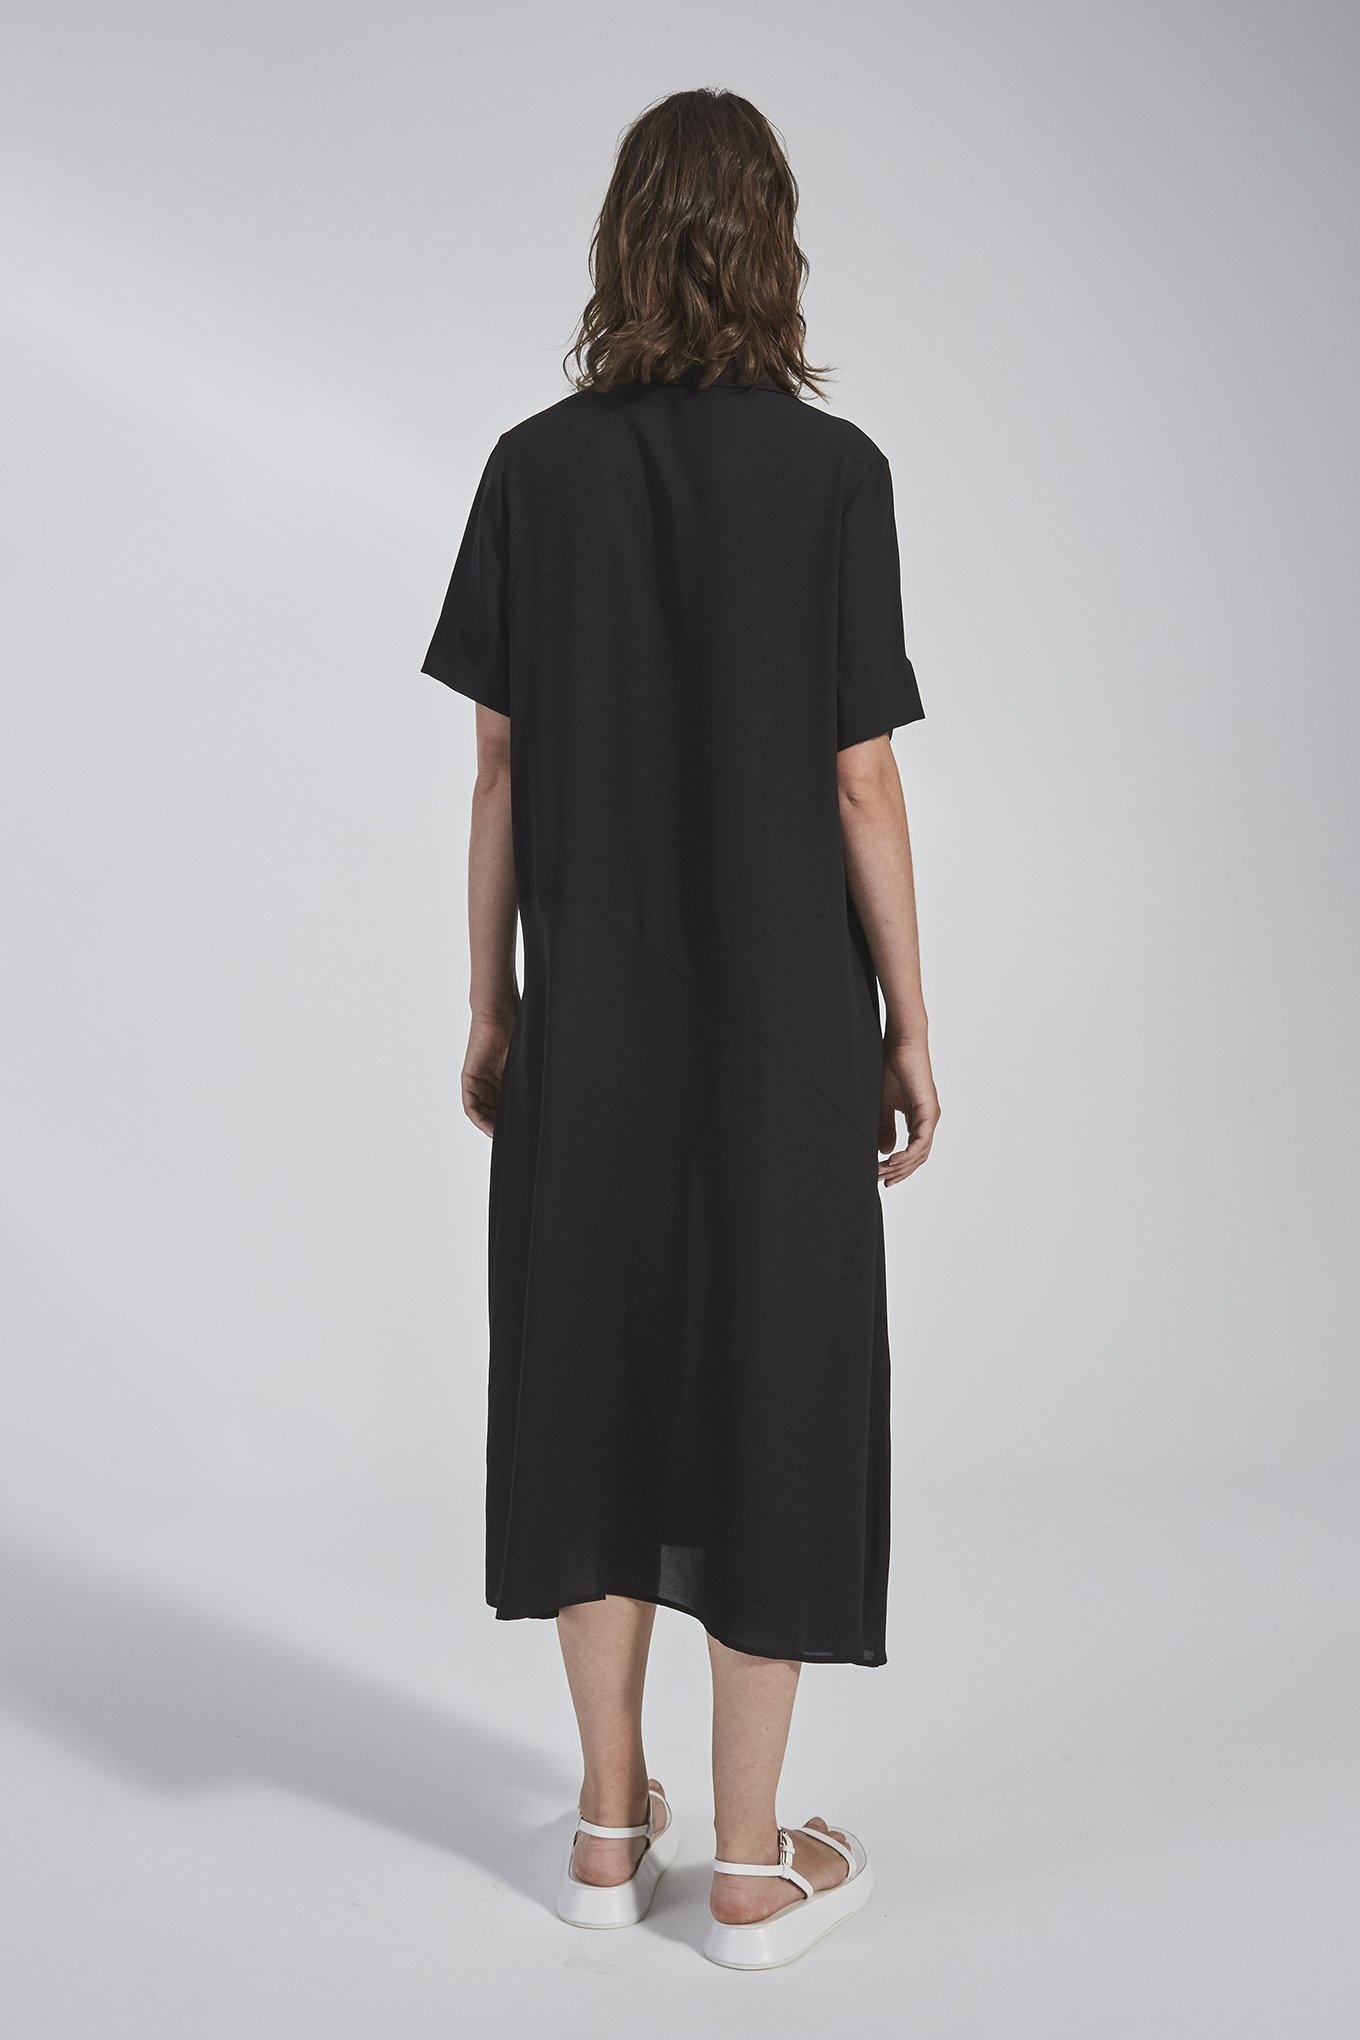 Jody dress Black